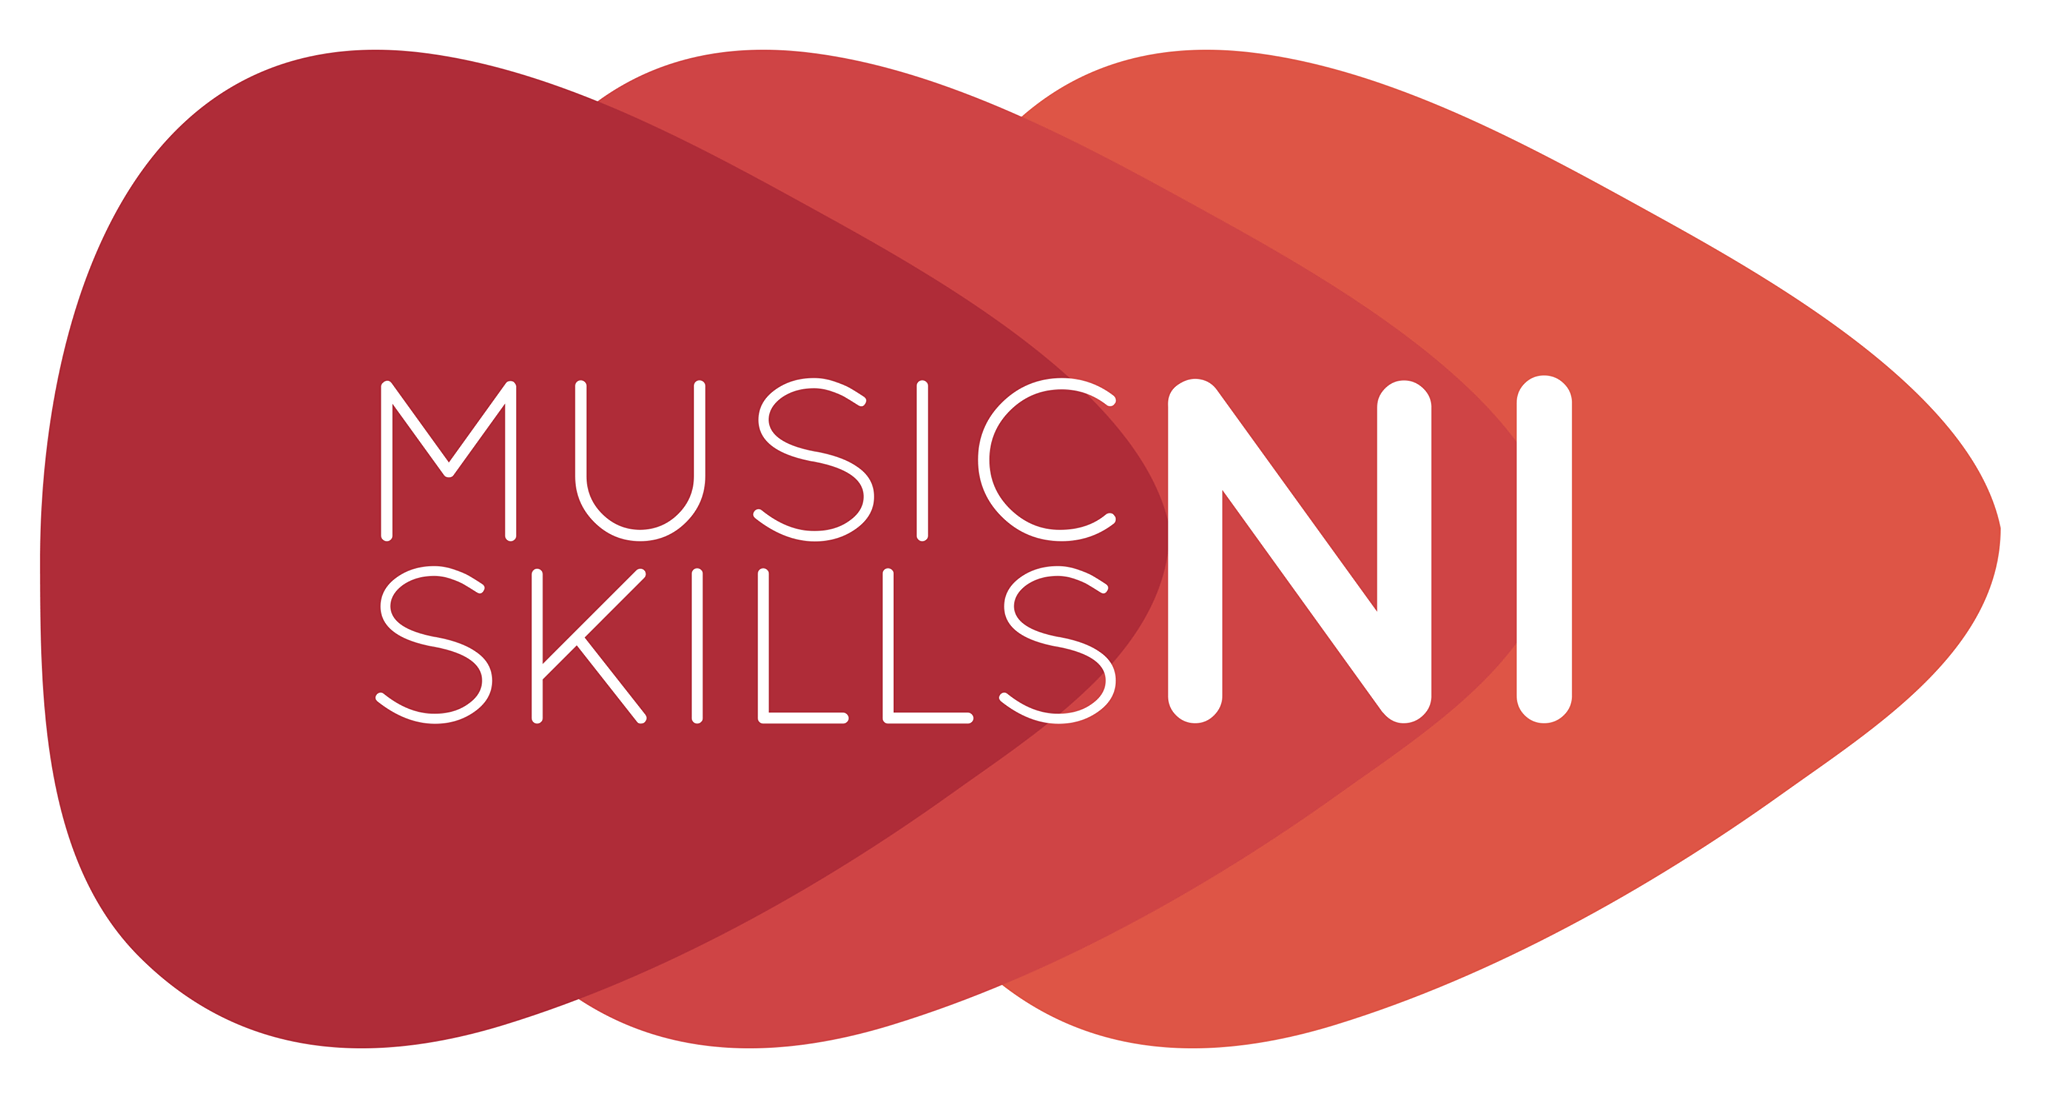 Music Skills NI